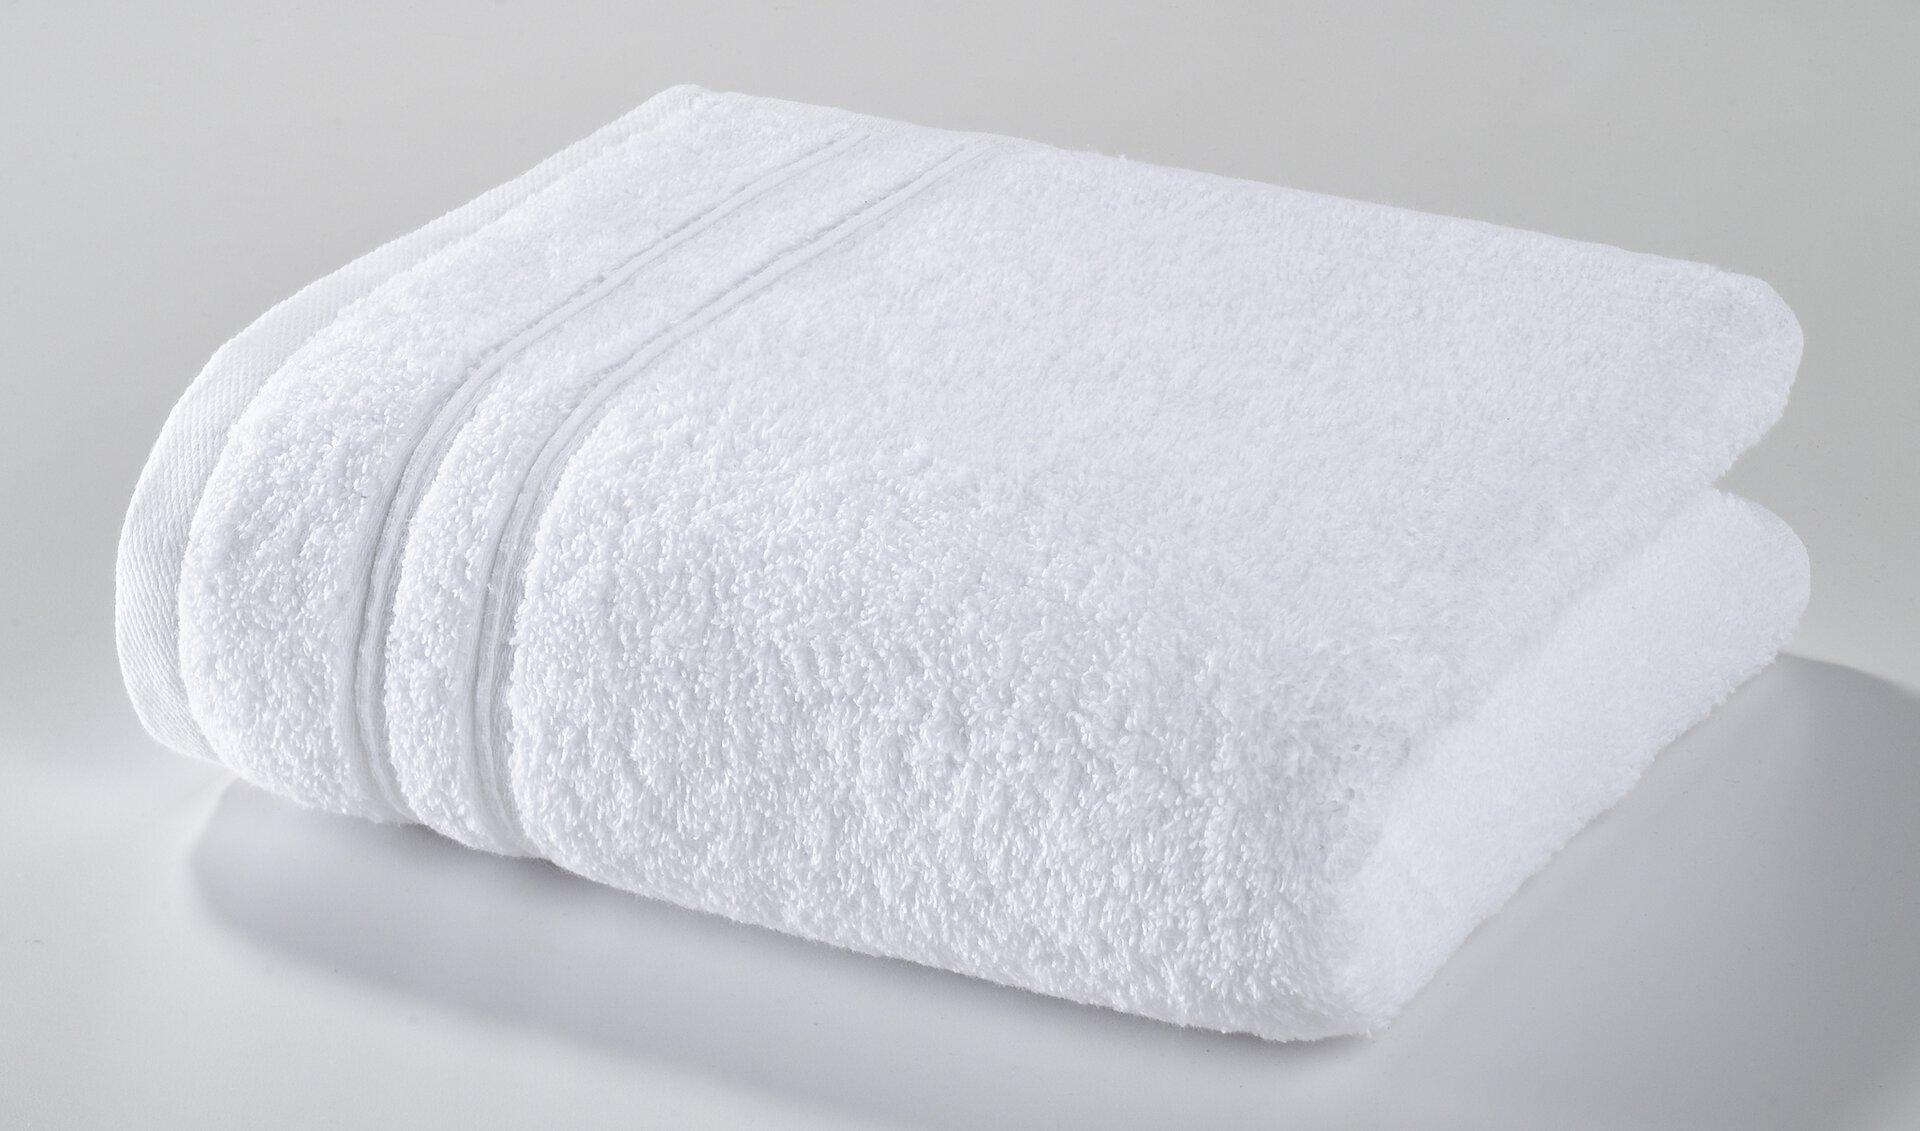 Duschtuch Porto Casa Nova Textil weiß 70 x 140 cm